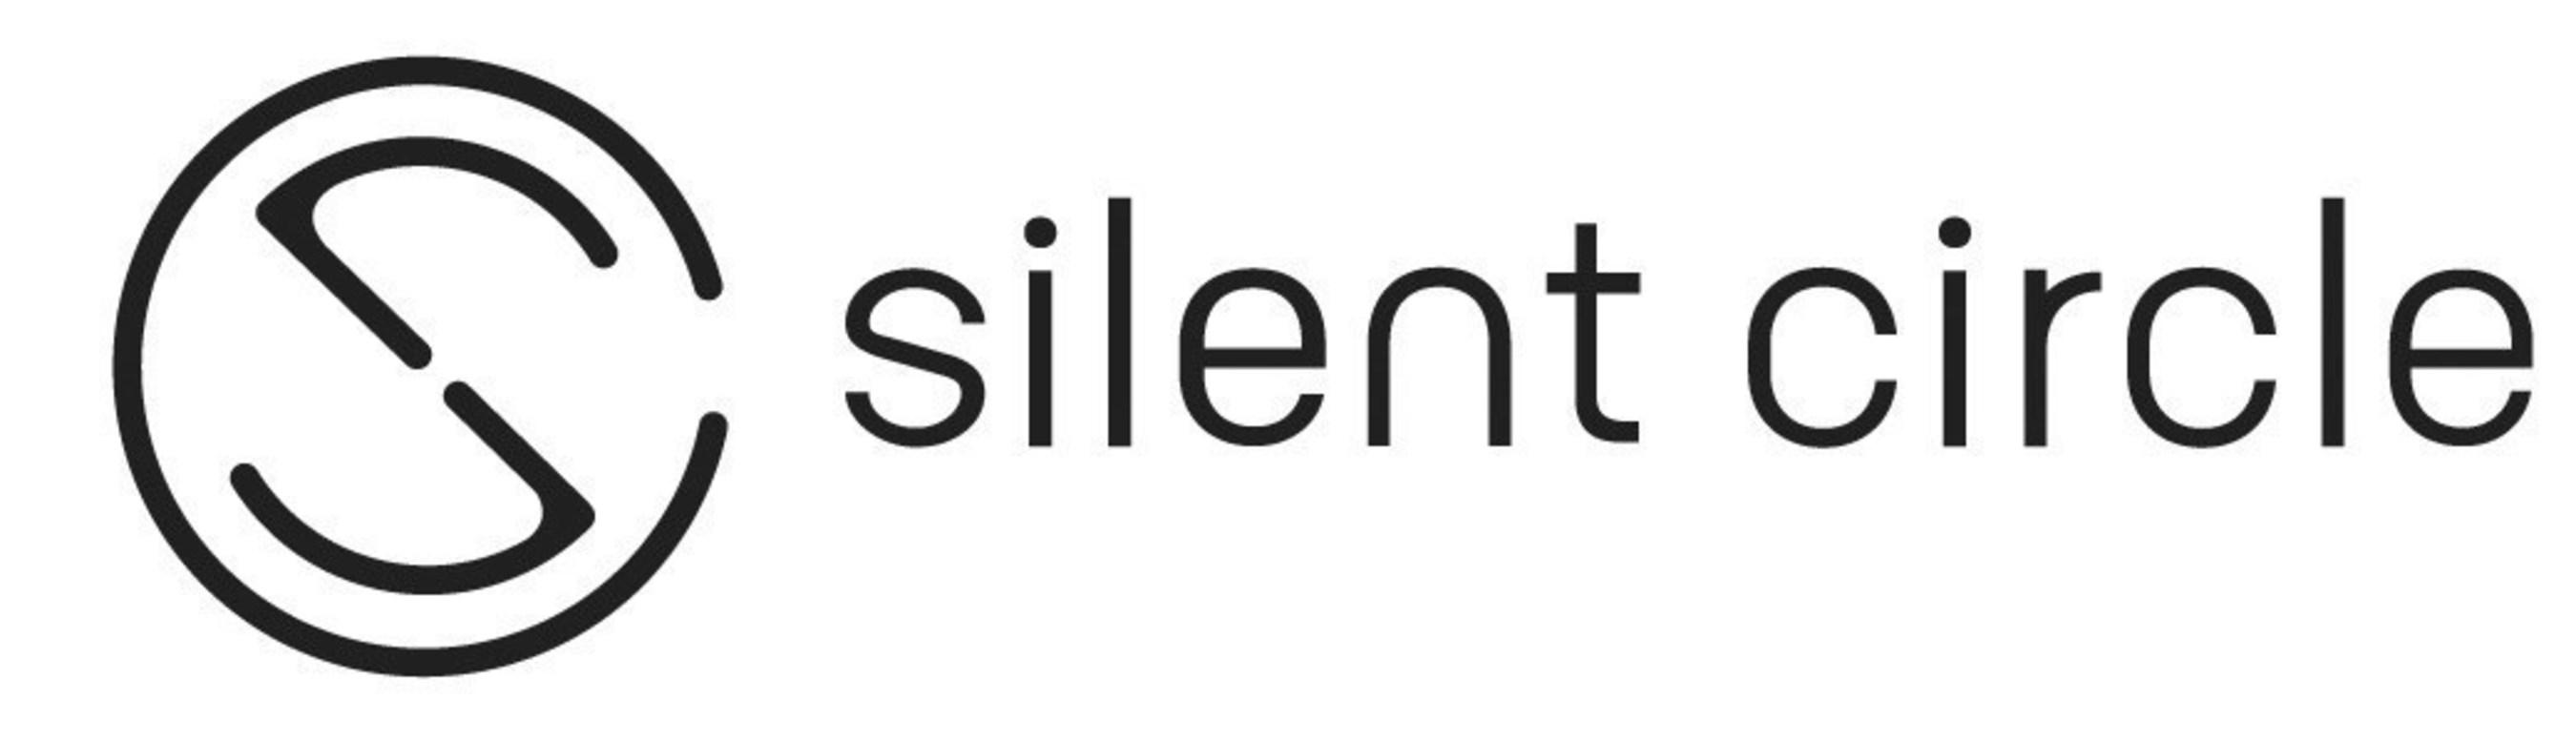 Silent Circle rejoint le programme Android for Work de Google